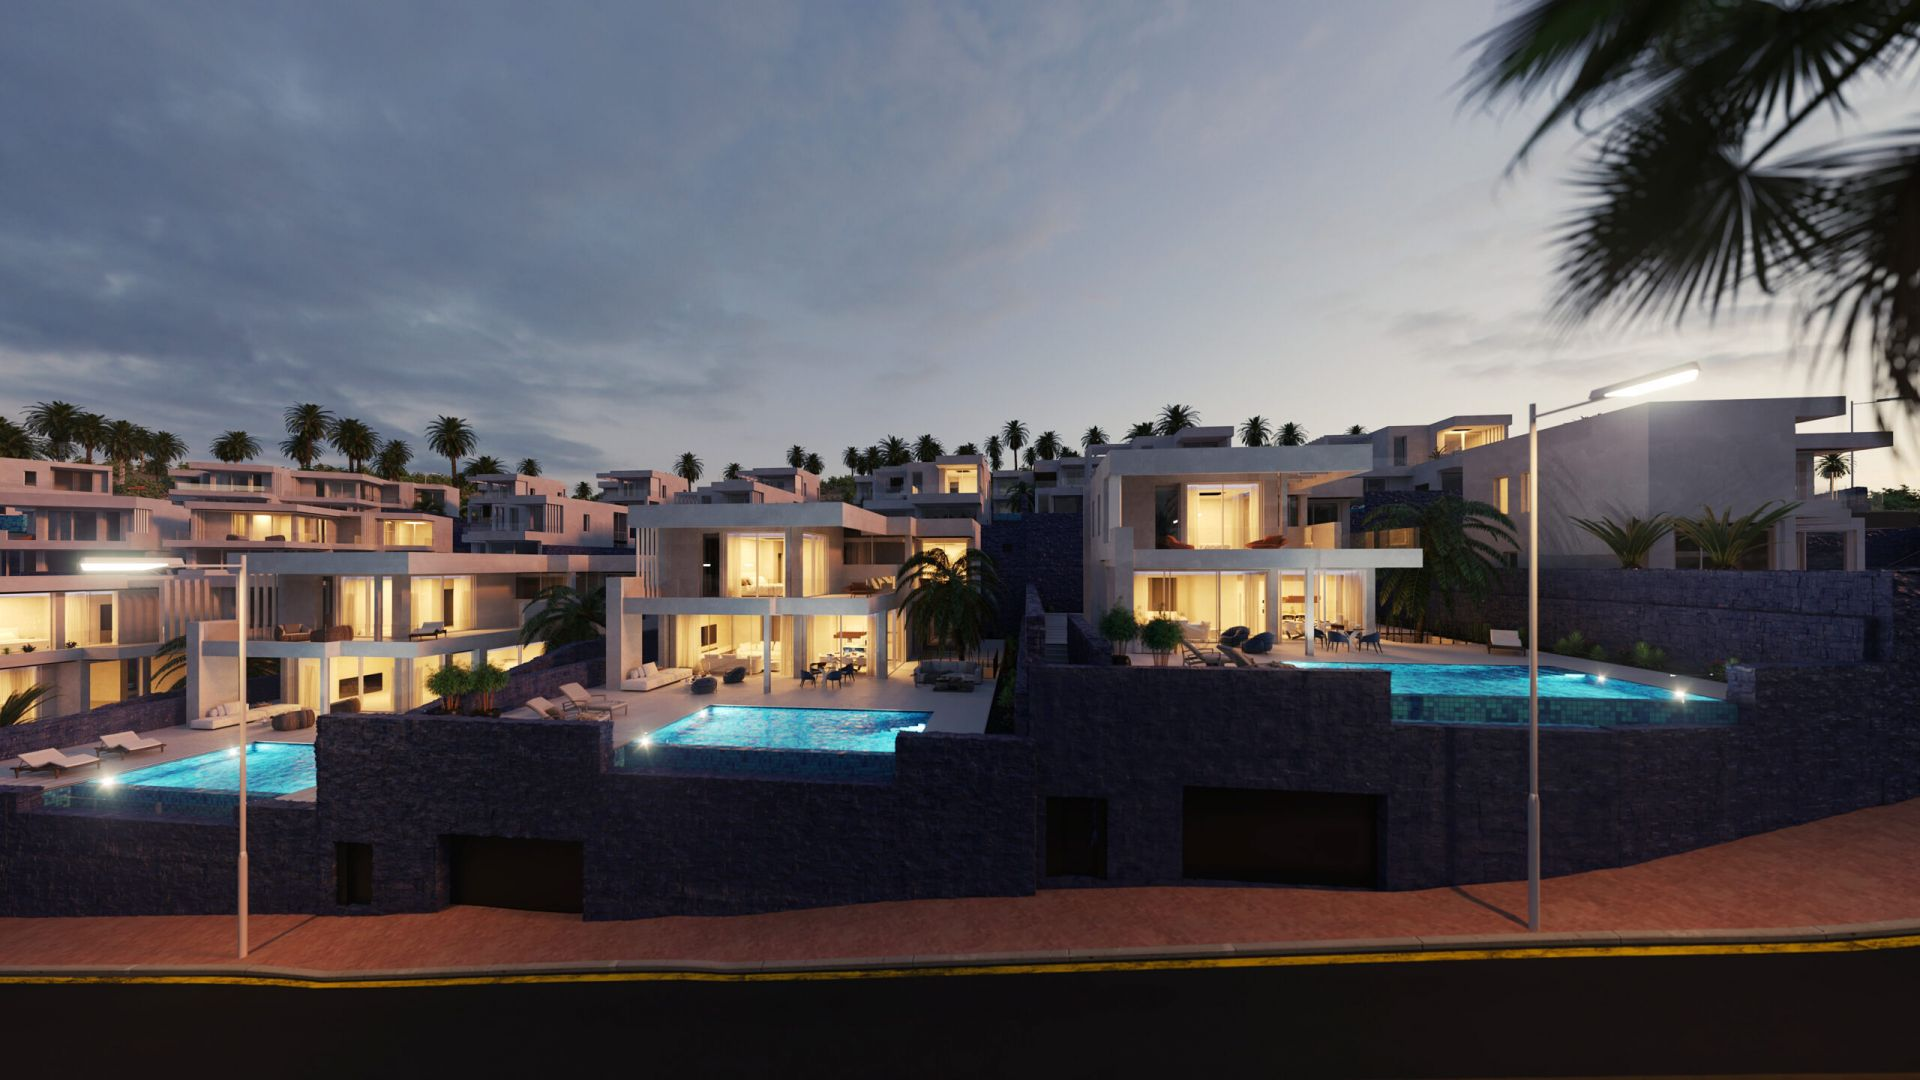 Serenity Luxury Villas Tenerife - Sustainable Steel Prefab Modular Homes – Collections